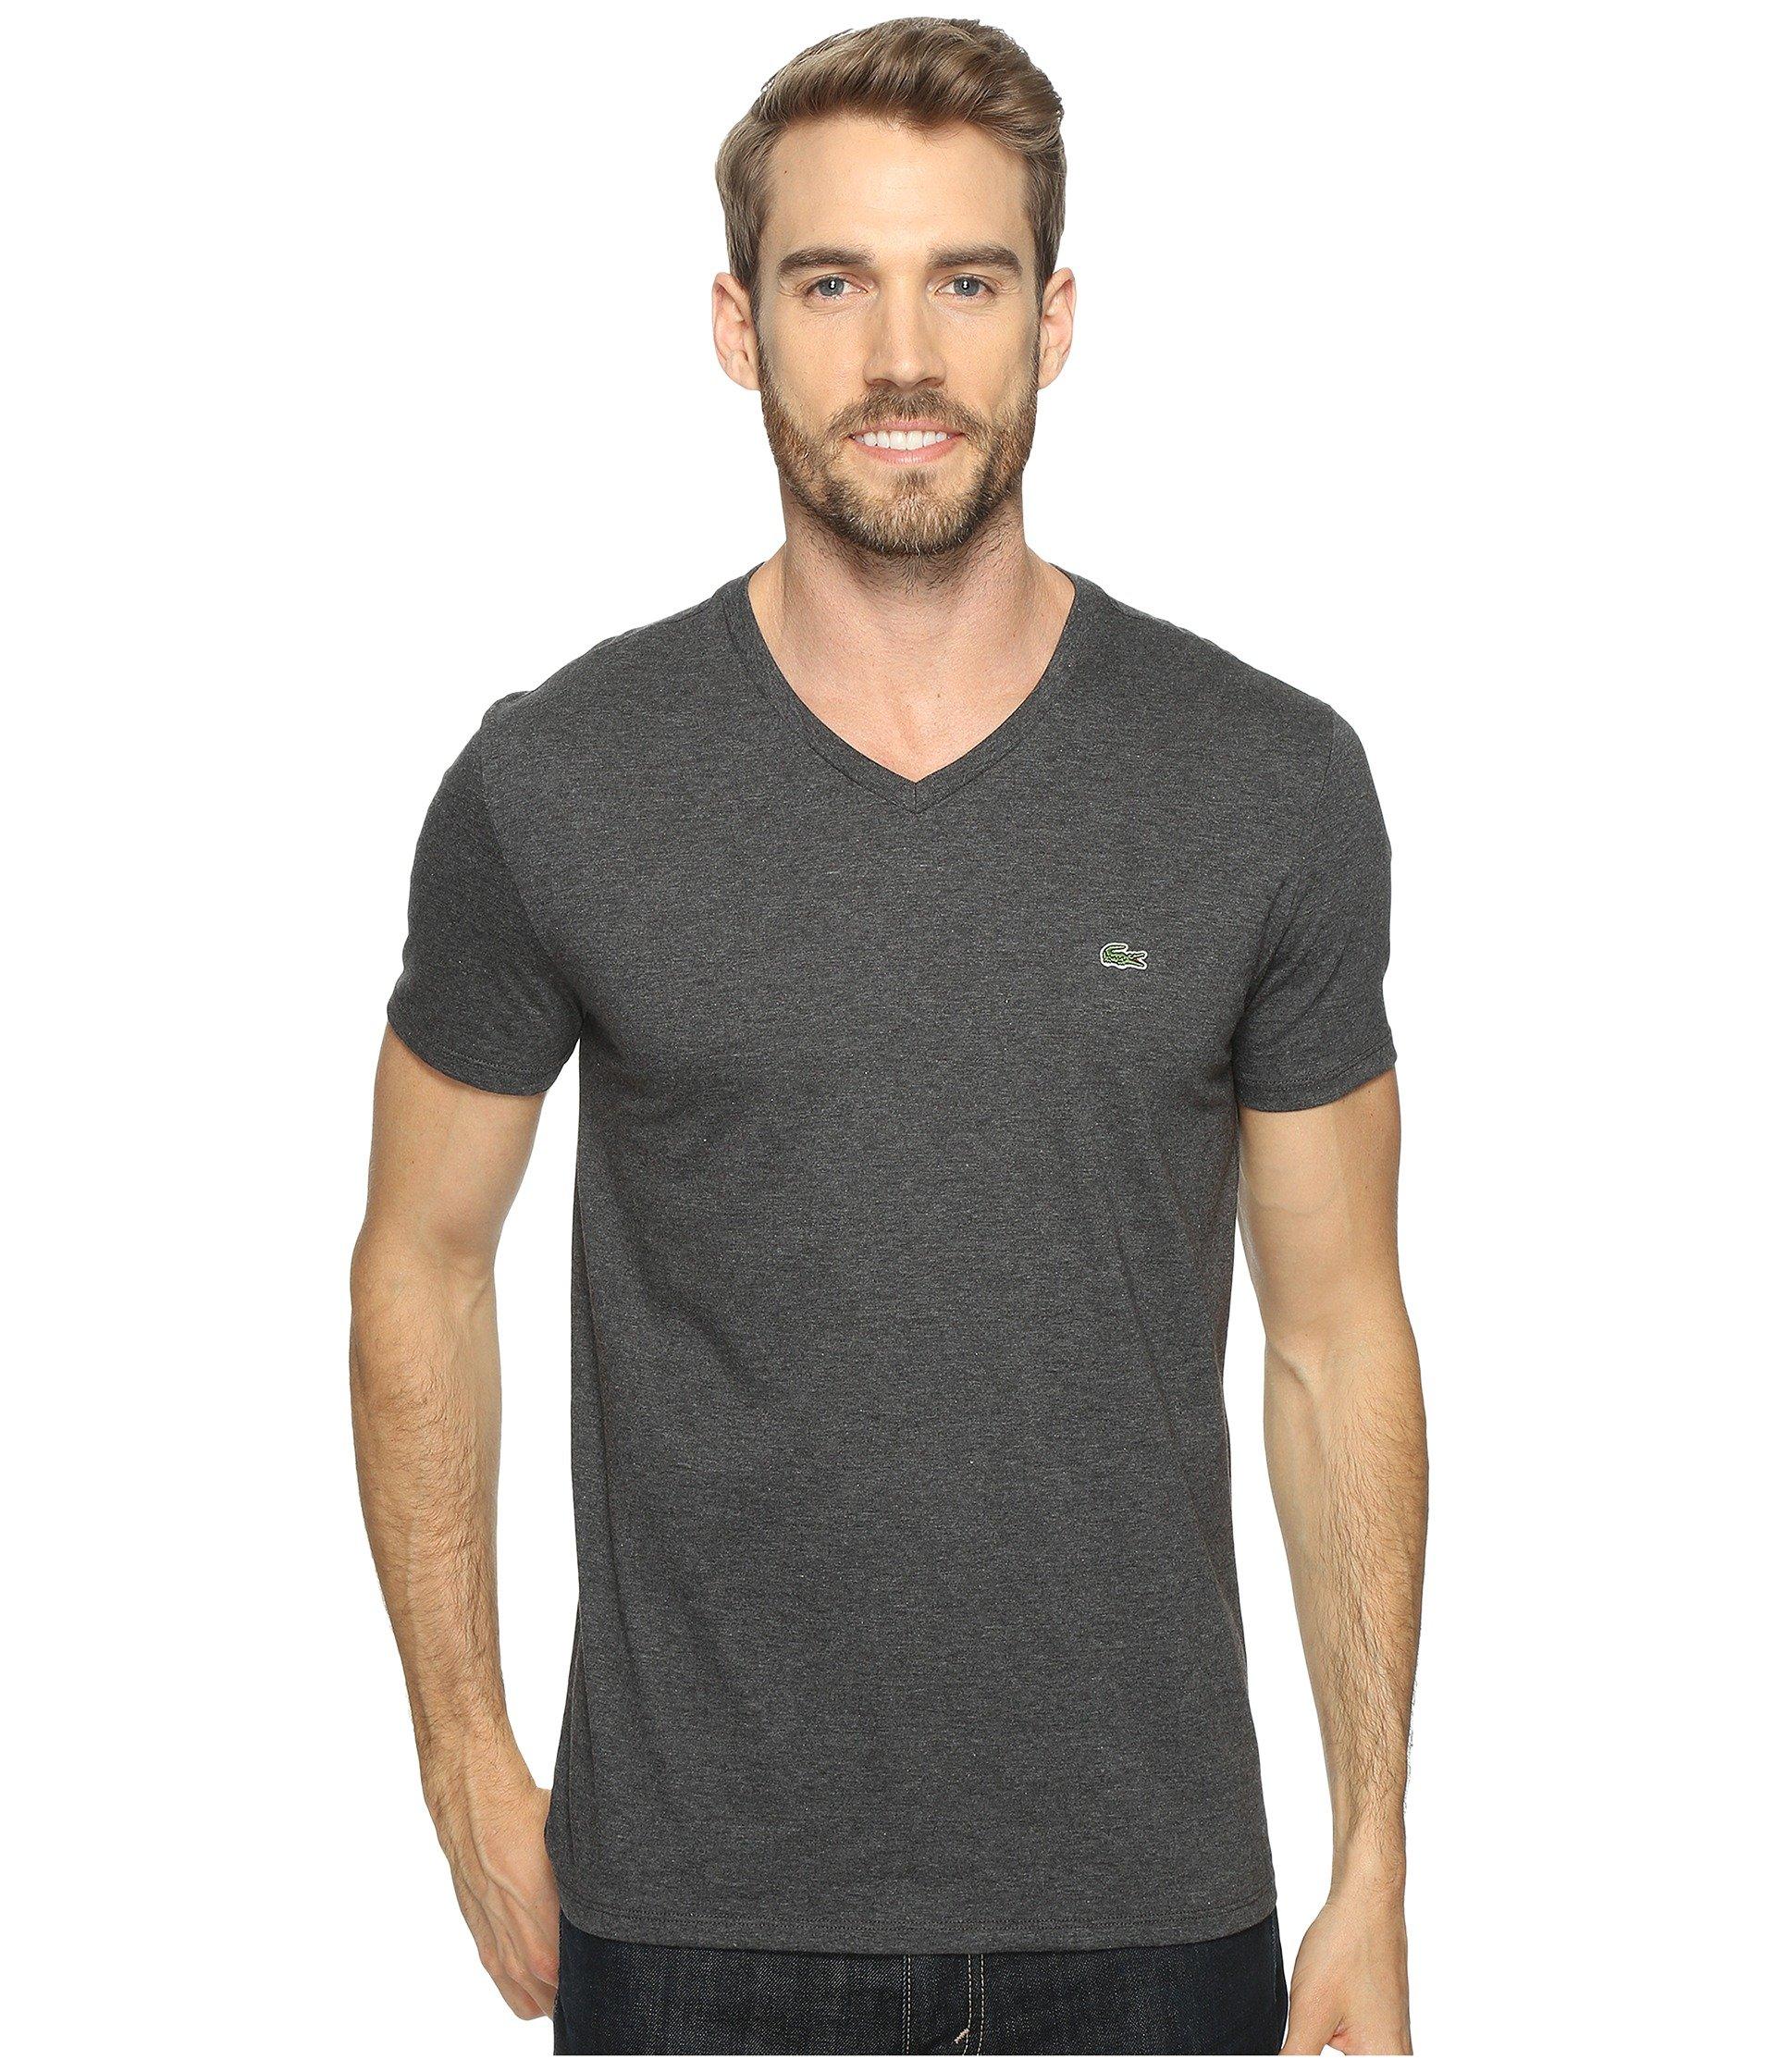 d1c9da95f479 Lacoste Short Sleeve Pima Jersey V-Neck T-Shirt In Urban Grey Chine